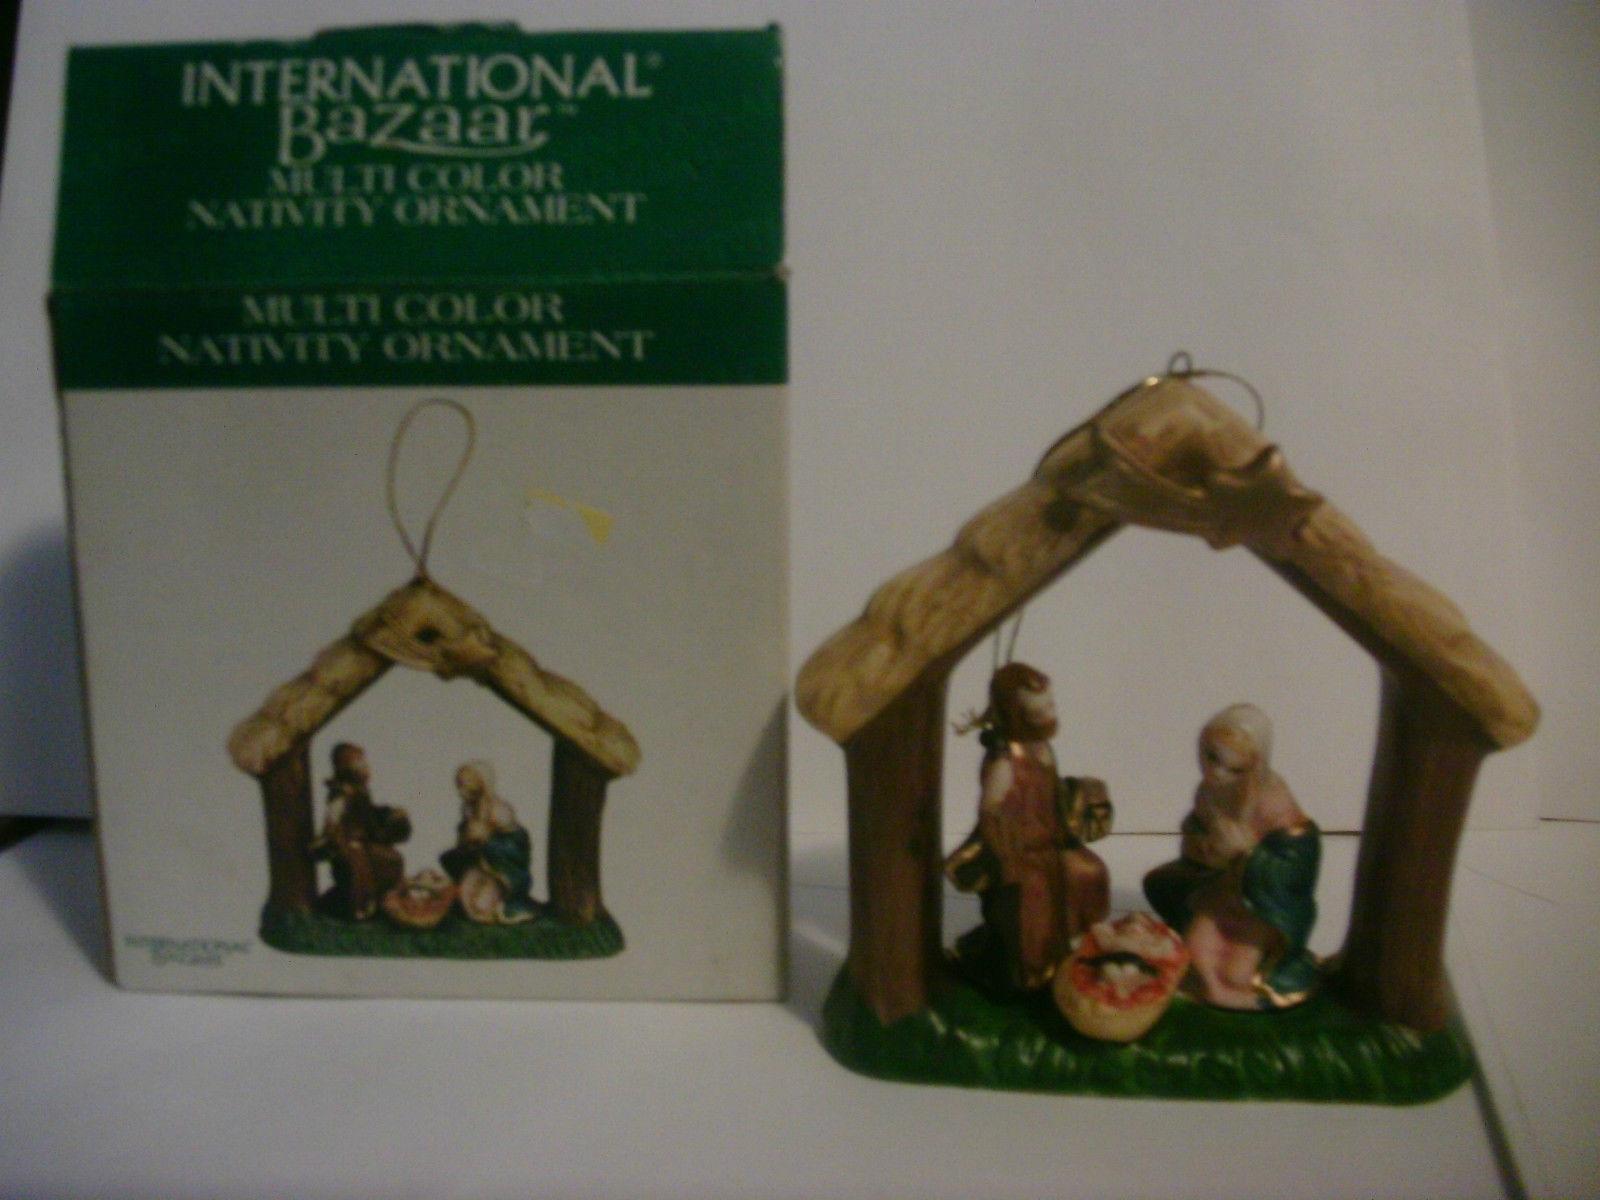 Nativity Ornament Multi Color International Bazaar image 2